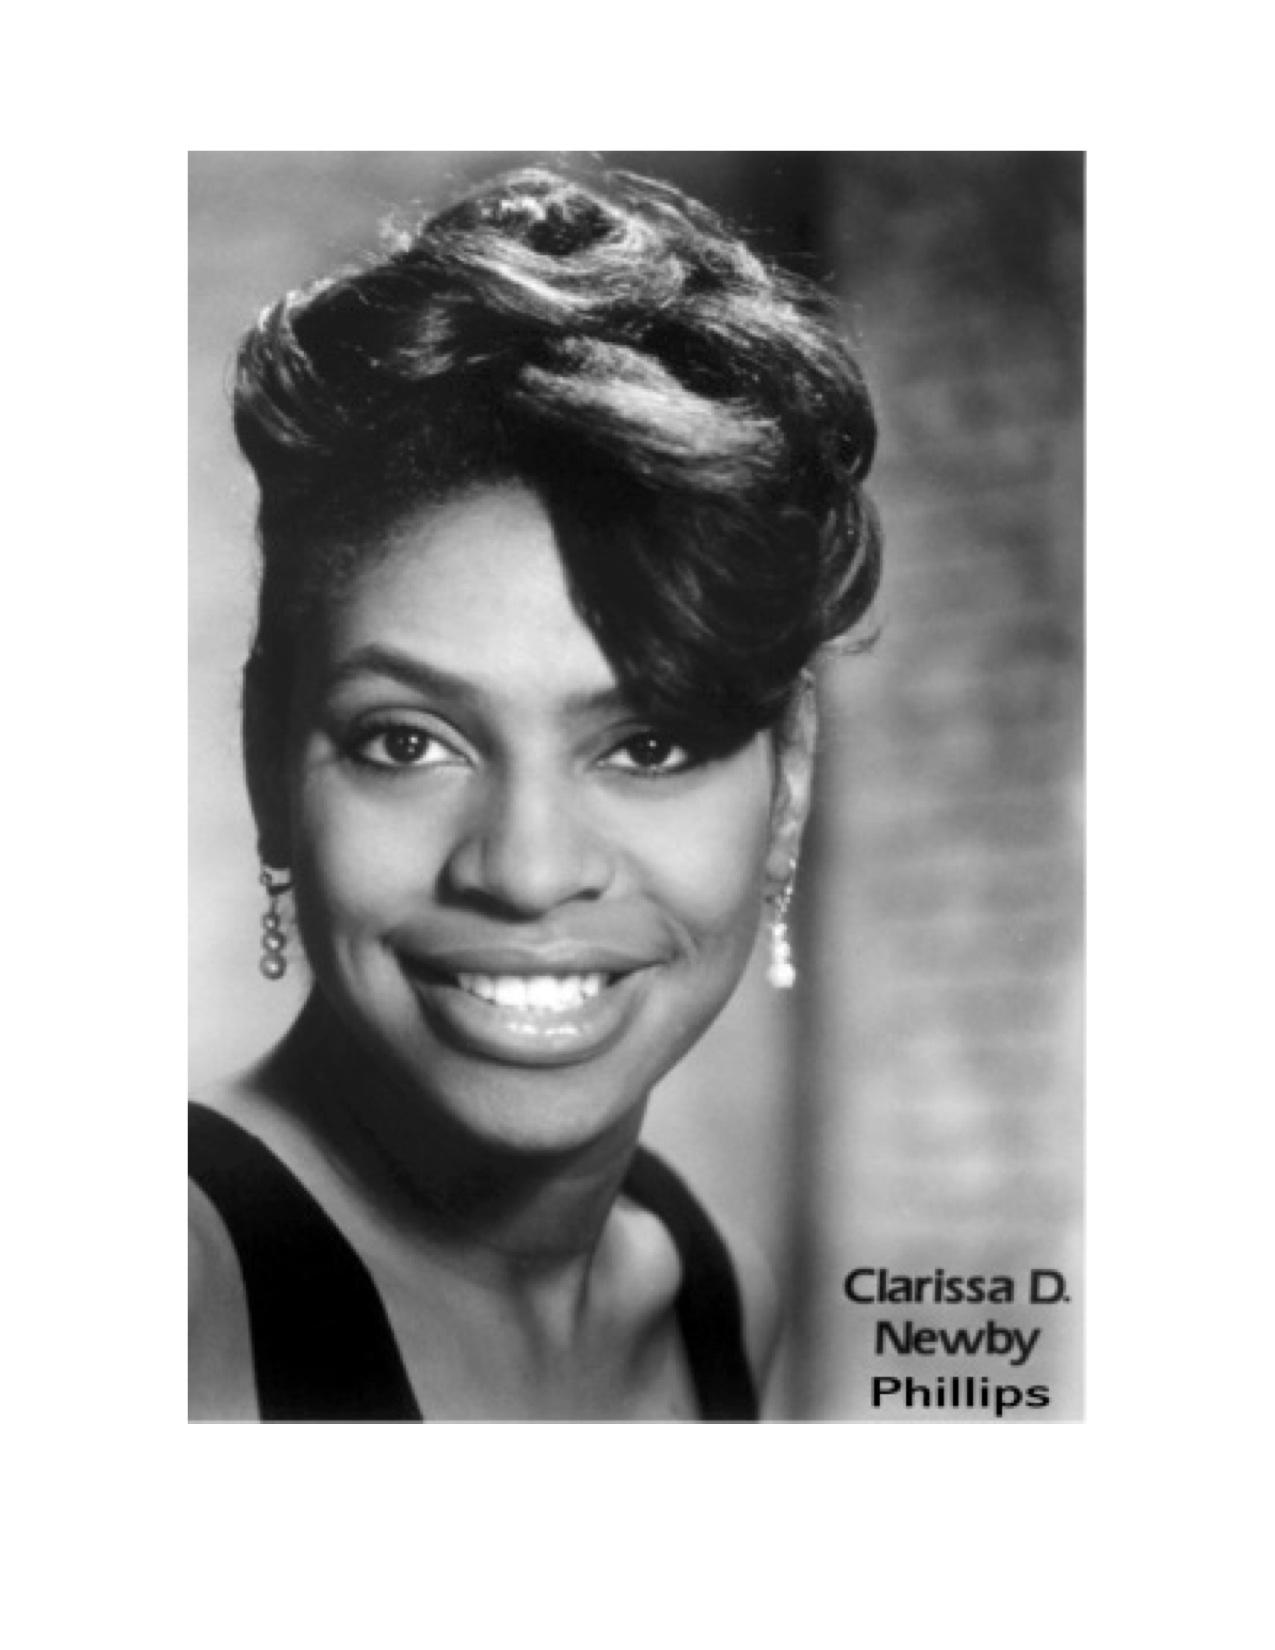 Clarissa Newby Phillips, Dance Department Chair